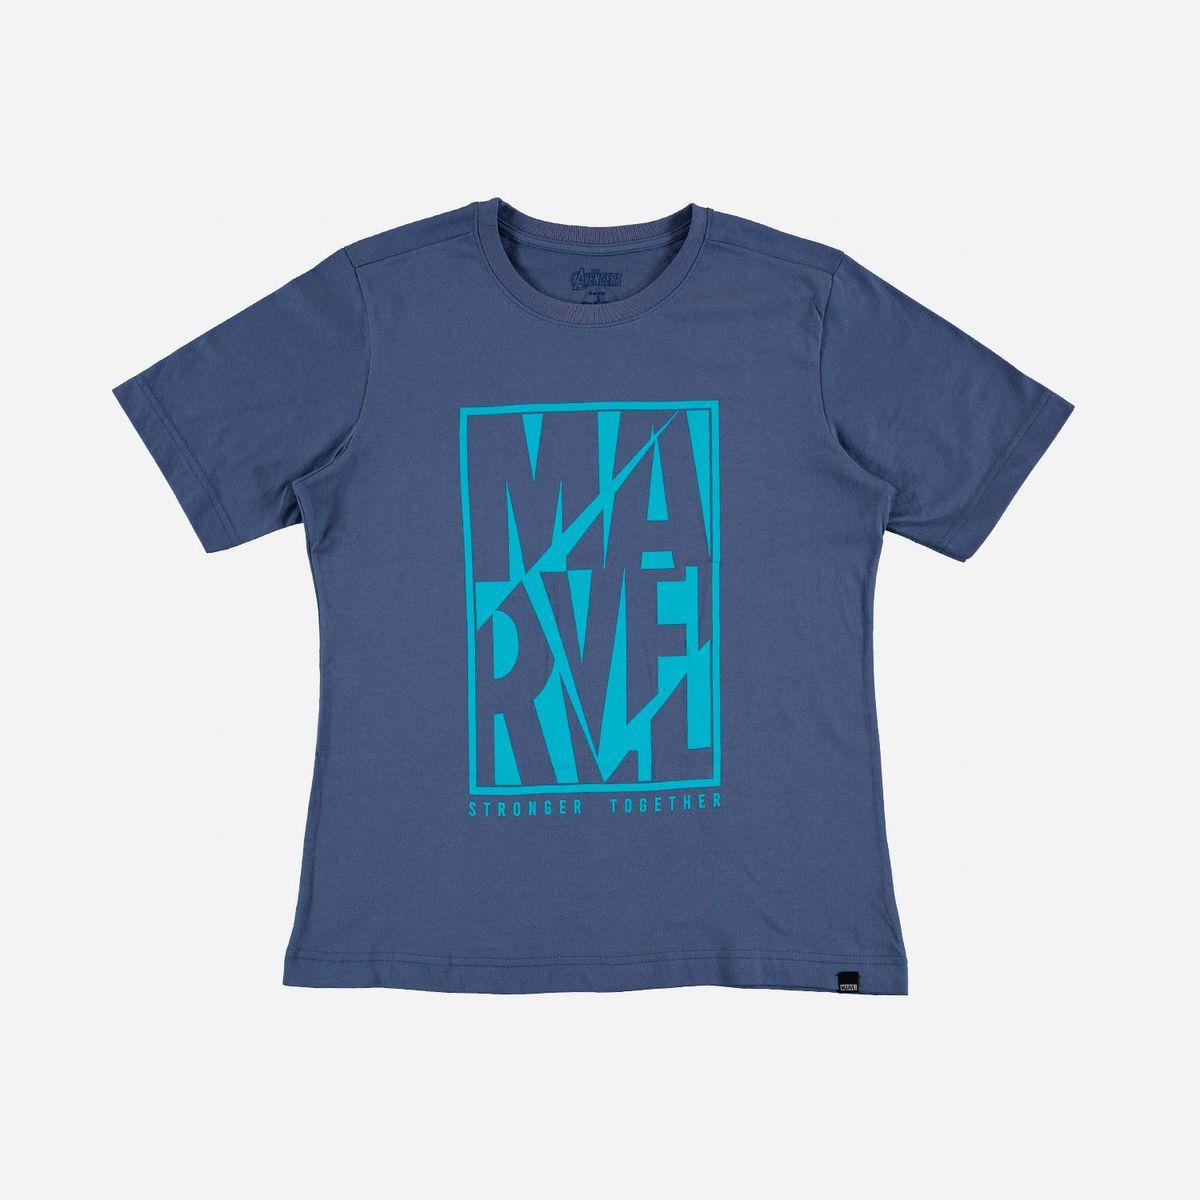 232891-camiseta-mujer-marvel-manga-corta-1